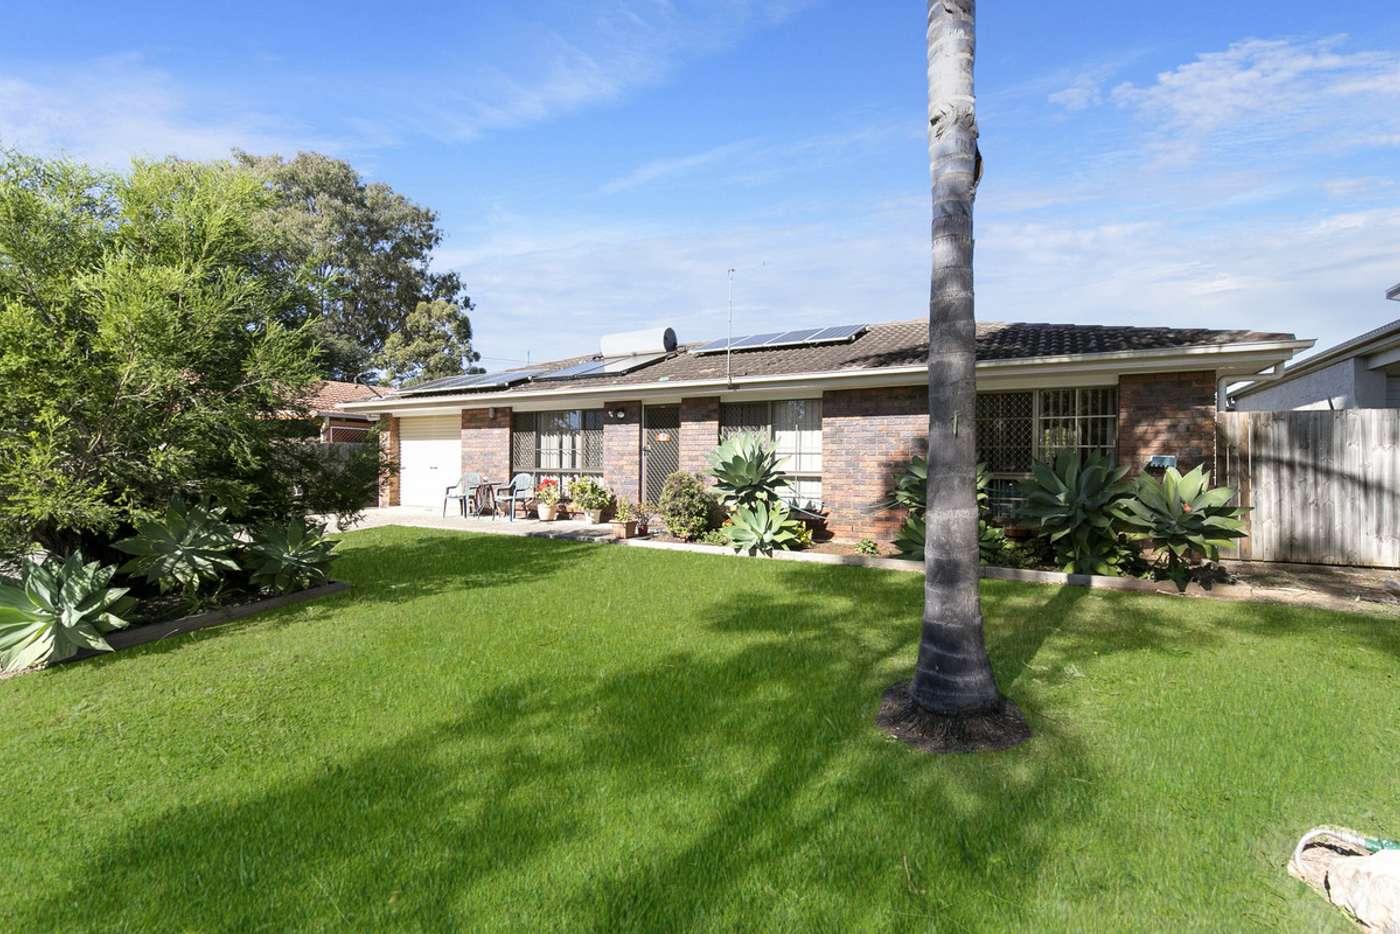 Main view of Homely house listing, 84 Bainbridge Street, Ormiston QLD 4160